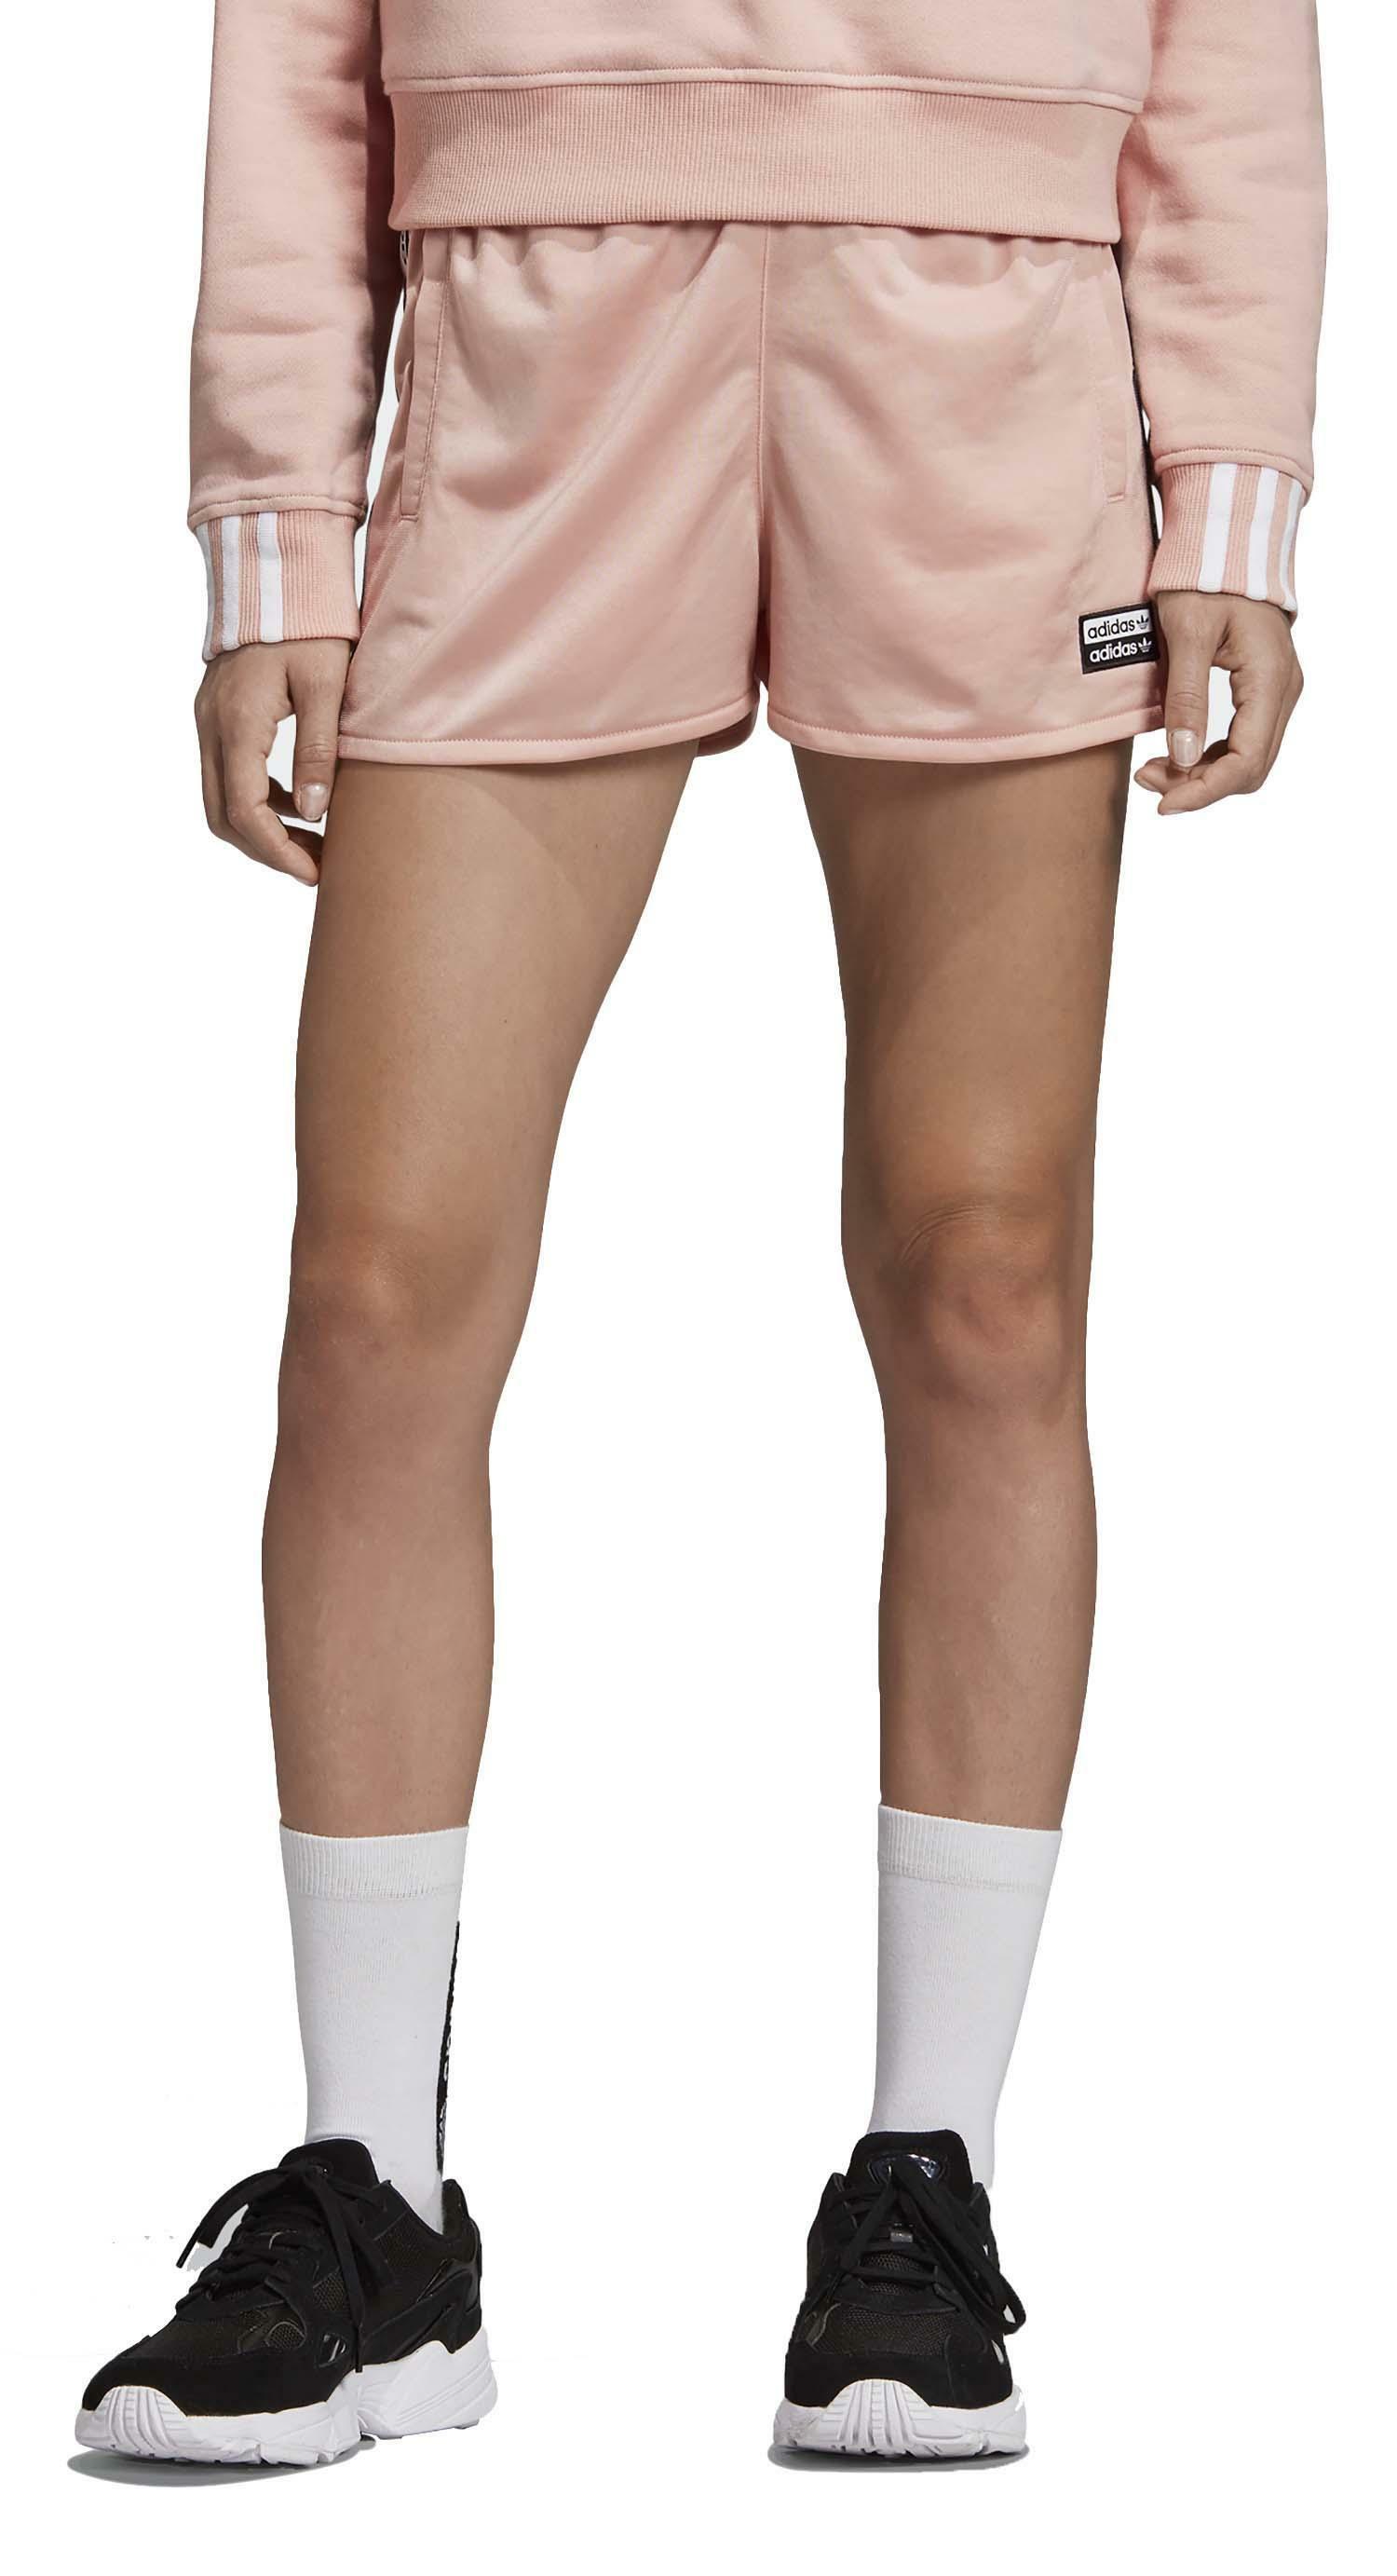 pantaloni adidas donna rosa